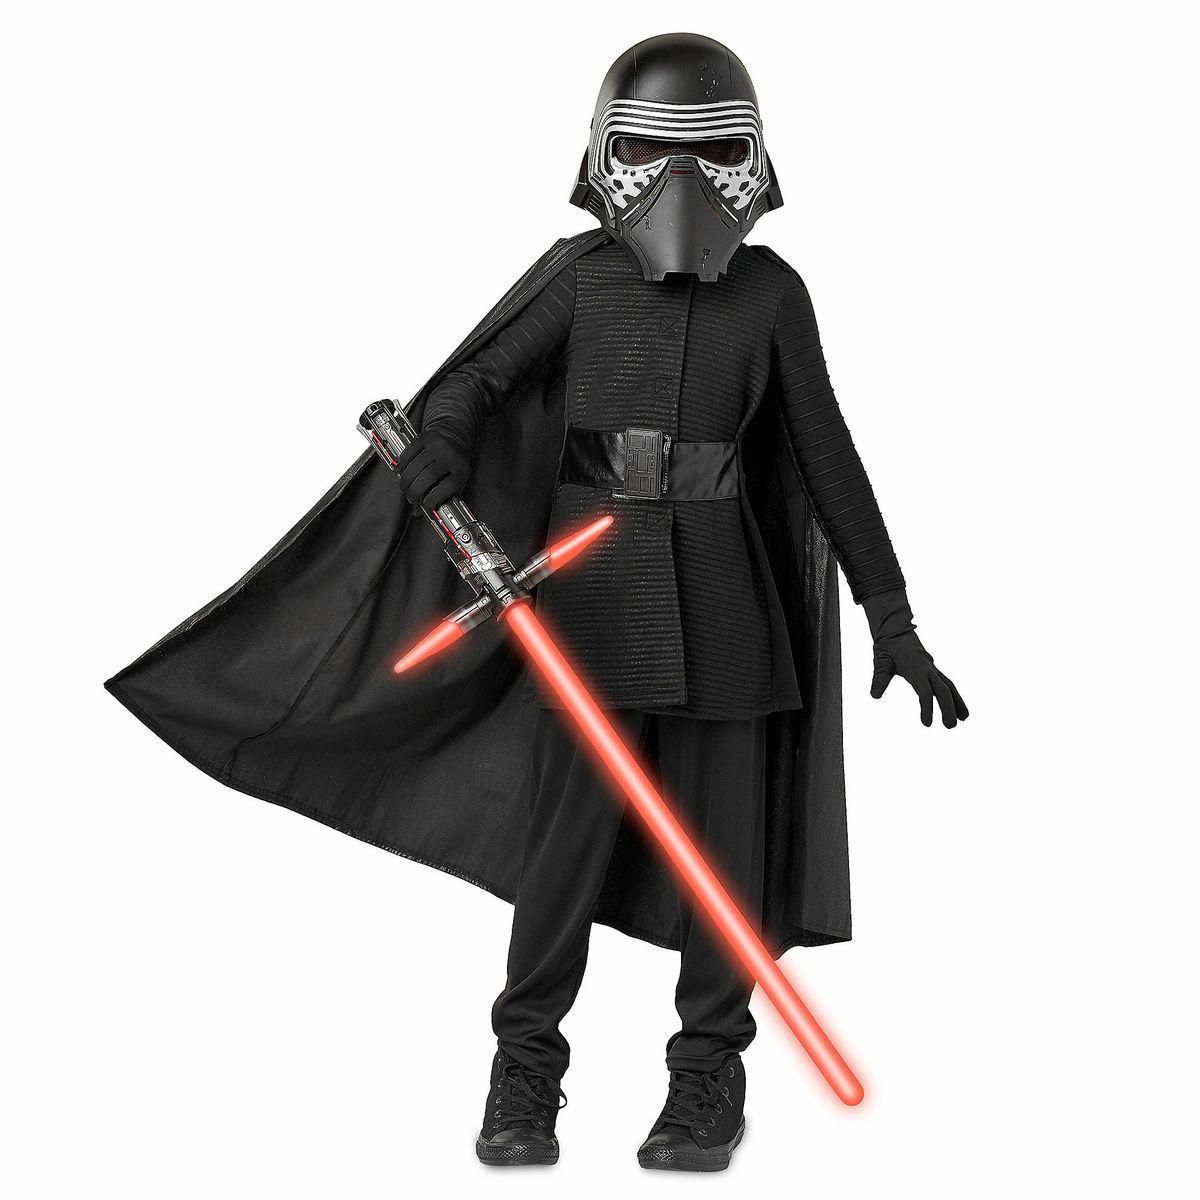 Kylo Ren Costume for Kids - Star Wars: The Last Jedi Size 11